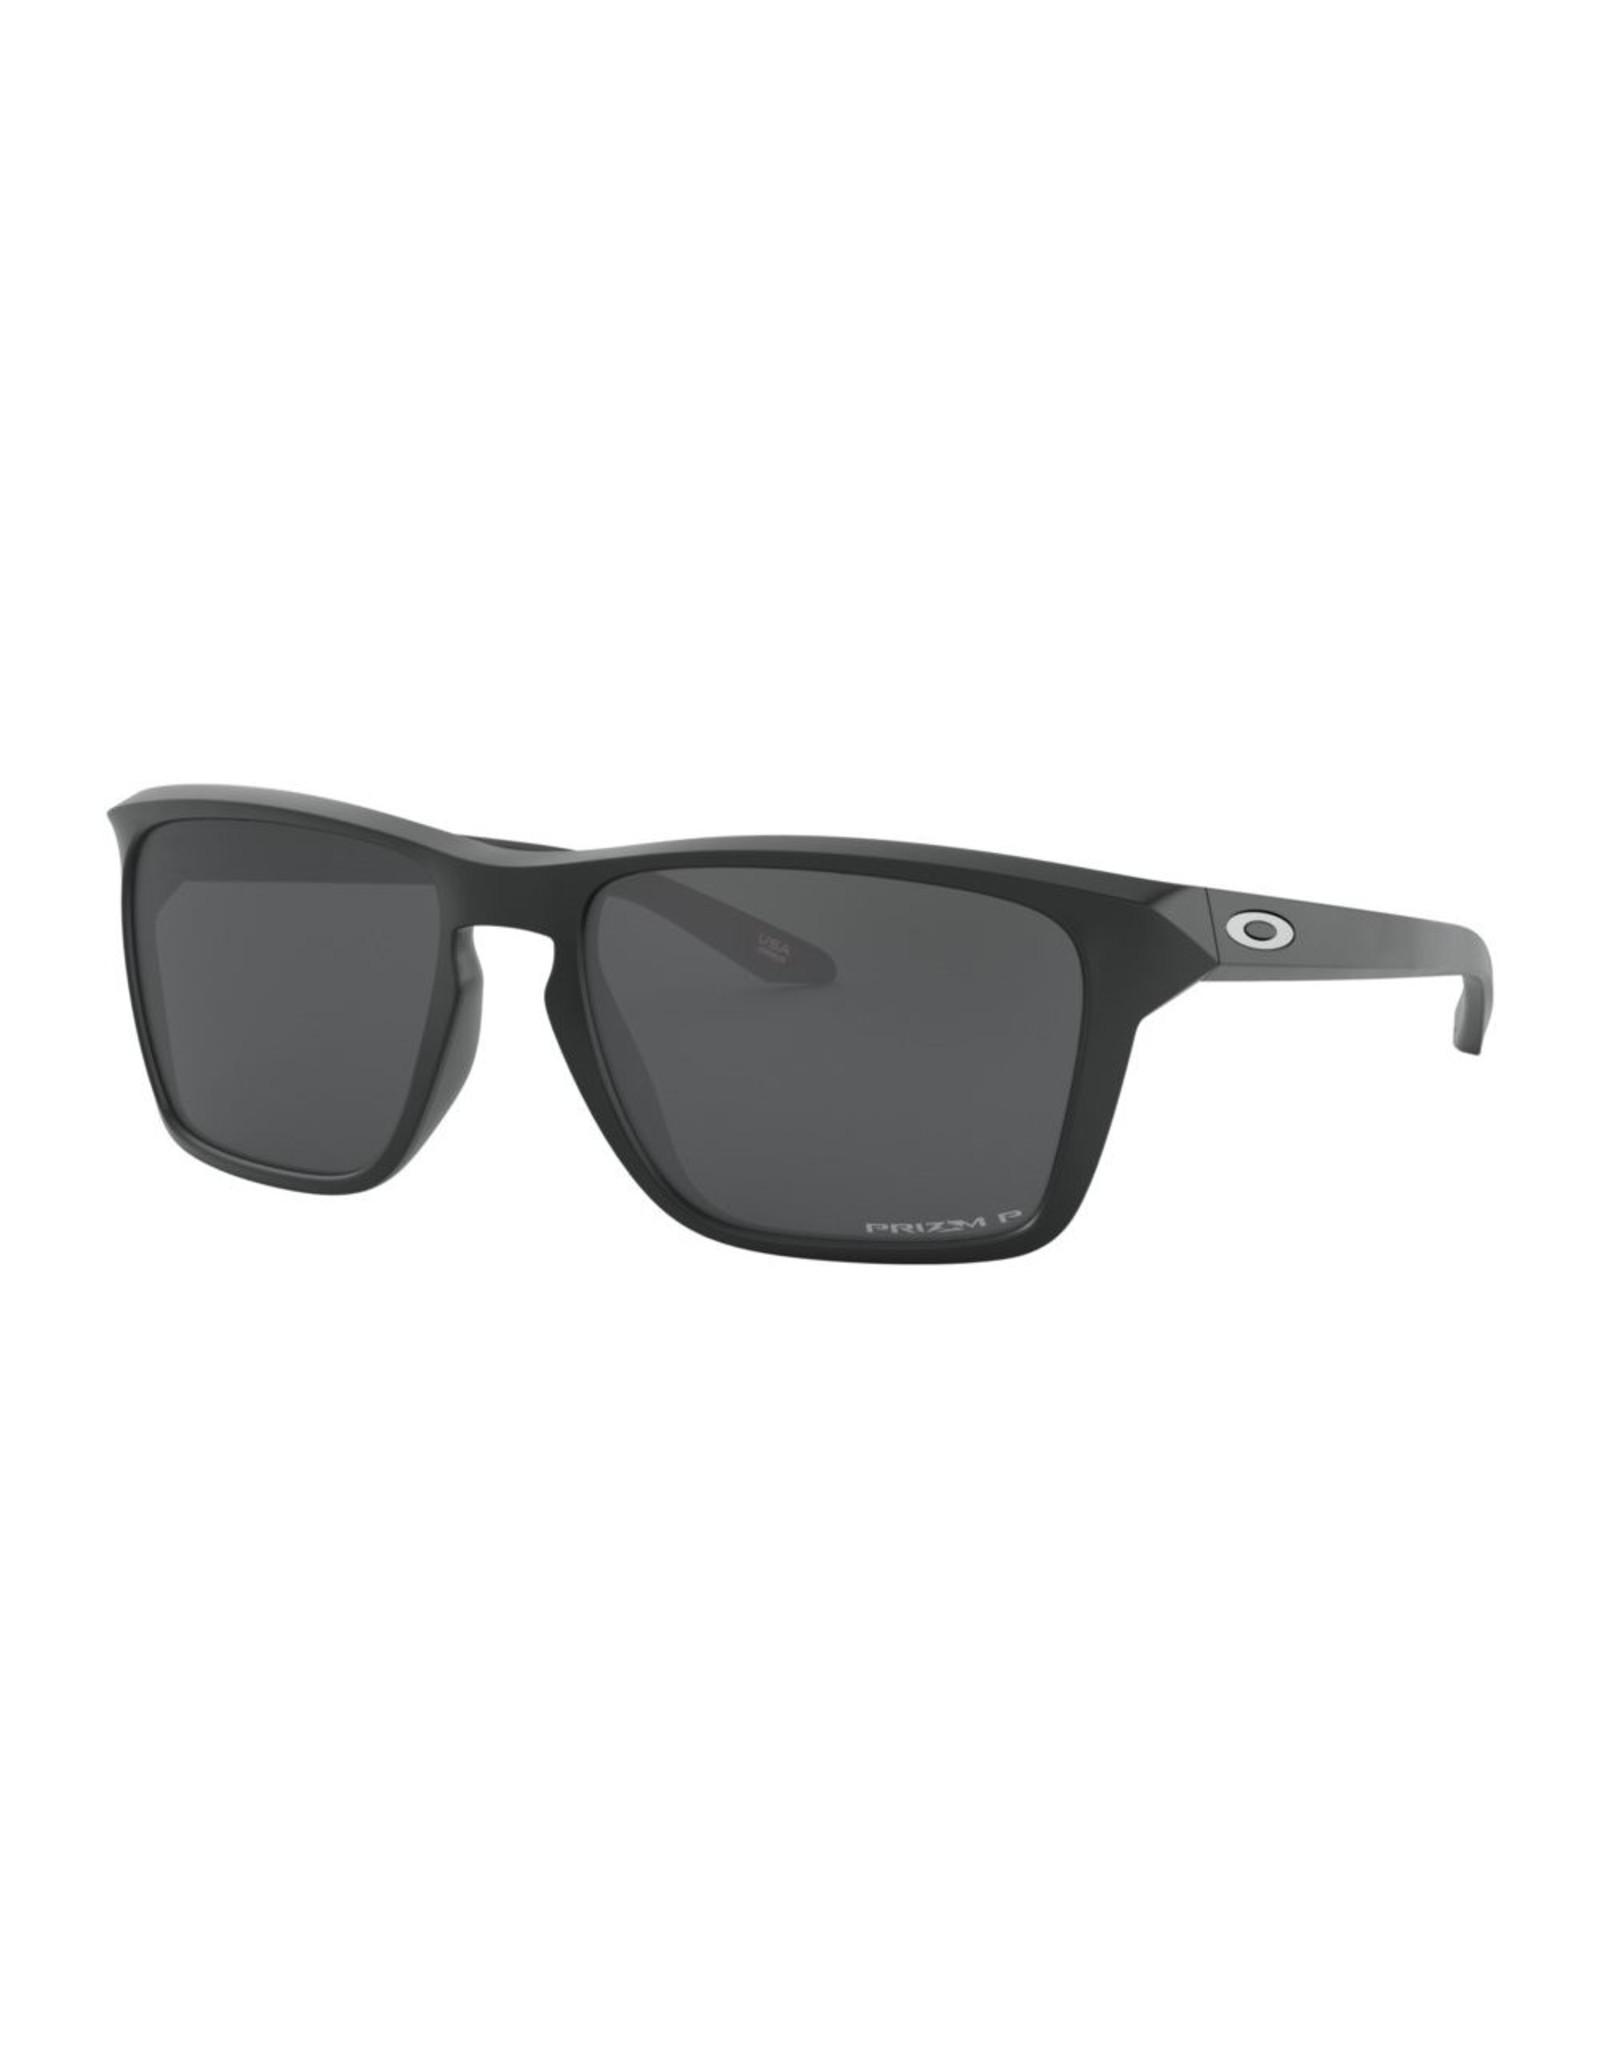 Oakley Mens sunglasses SYLAS matte black w/ prizm black iridium